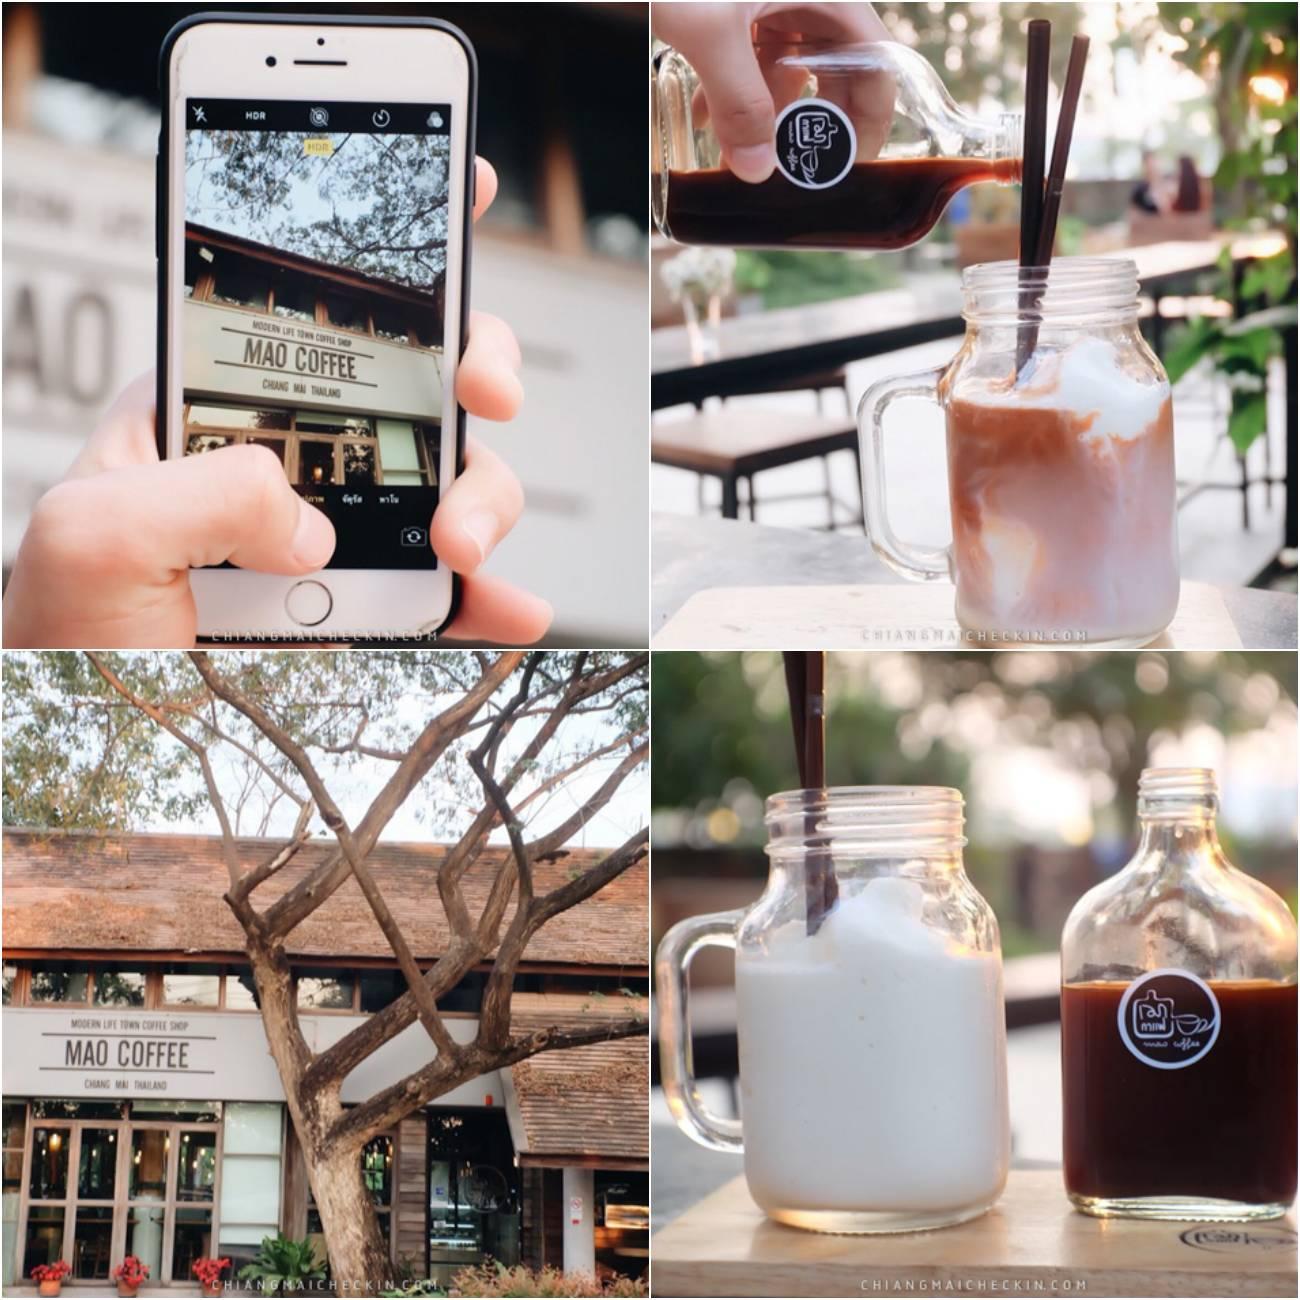 Mao Coffee กาแฟหลักสิบ บรรยากาศหลักพัน ร้านบรรยากาศดียยย์สบายๆเป็นกันเอง กาแฟรสเข้มอร่อยรับรองถูกใจคอกาแฟแน่นอนแวะมาลองชิมกัน